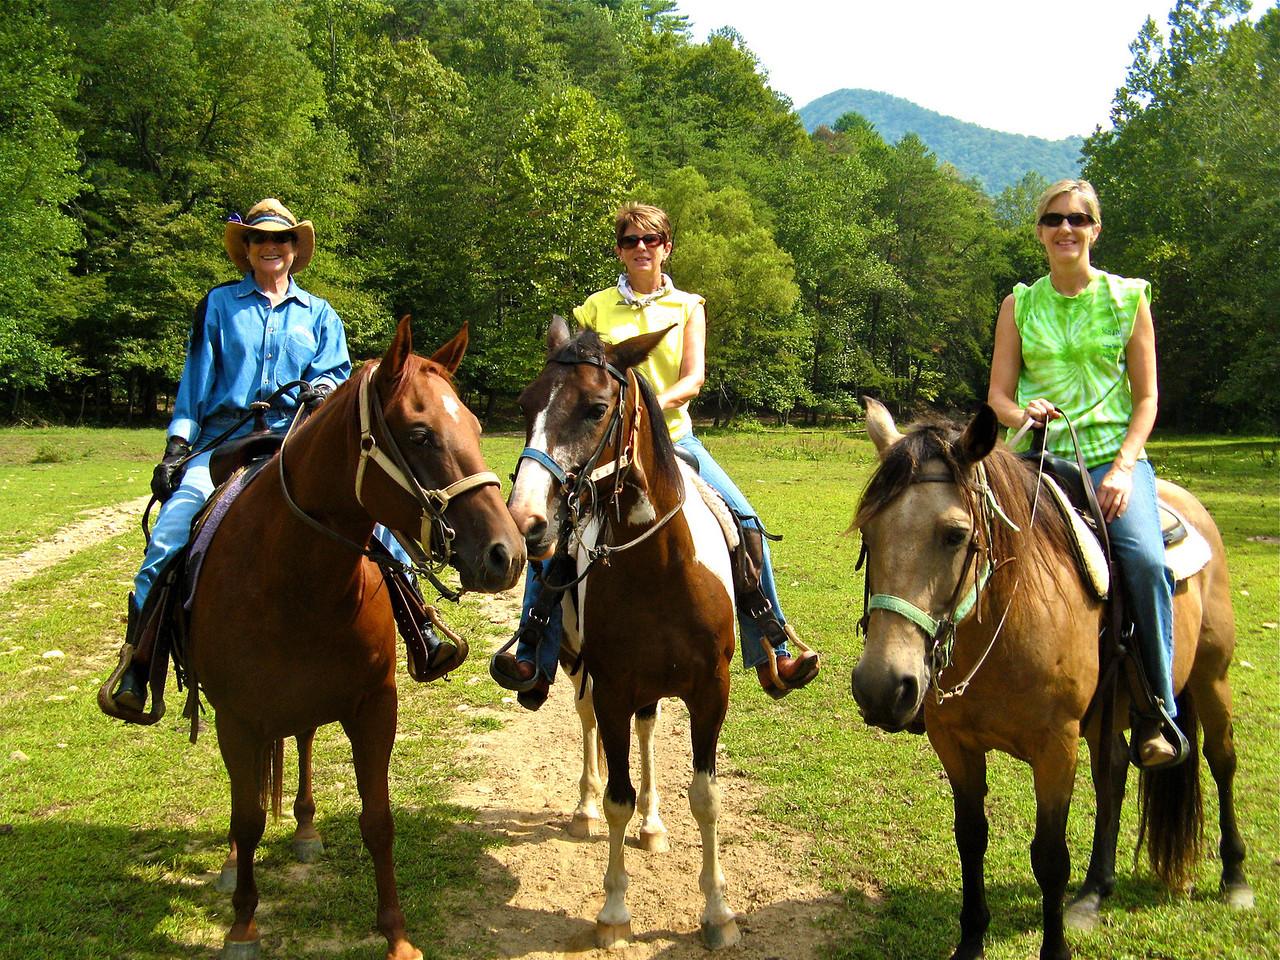 Skert, Susan and Nan at Trackrock Stables in N.GA.